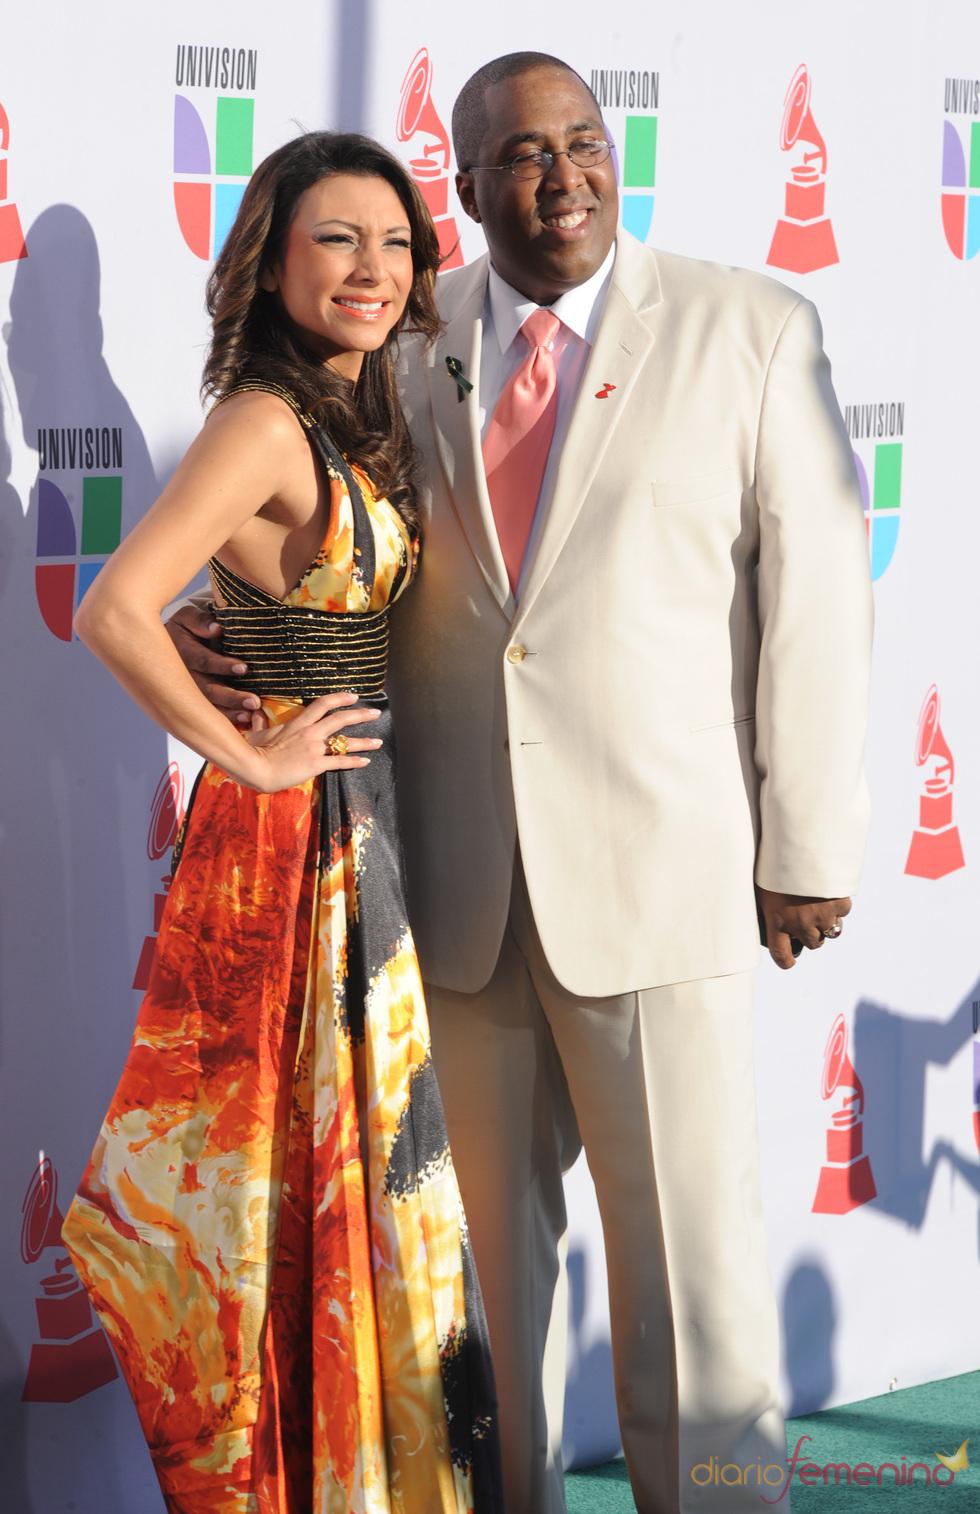 Liliana Gil y Henry Jiménez en los Grammy Latino 2010